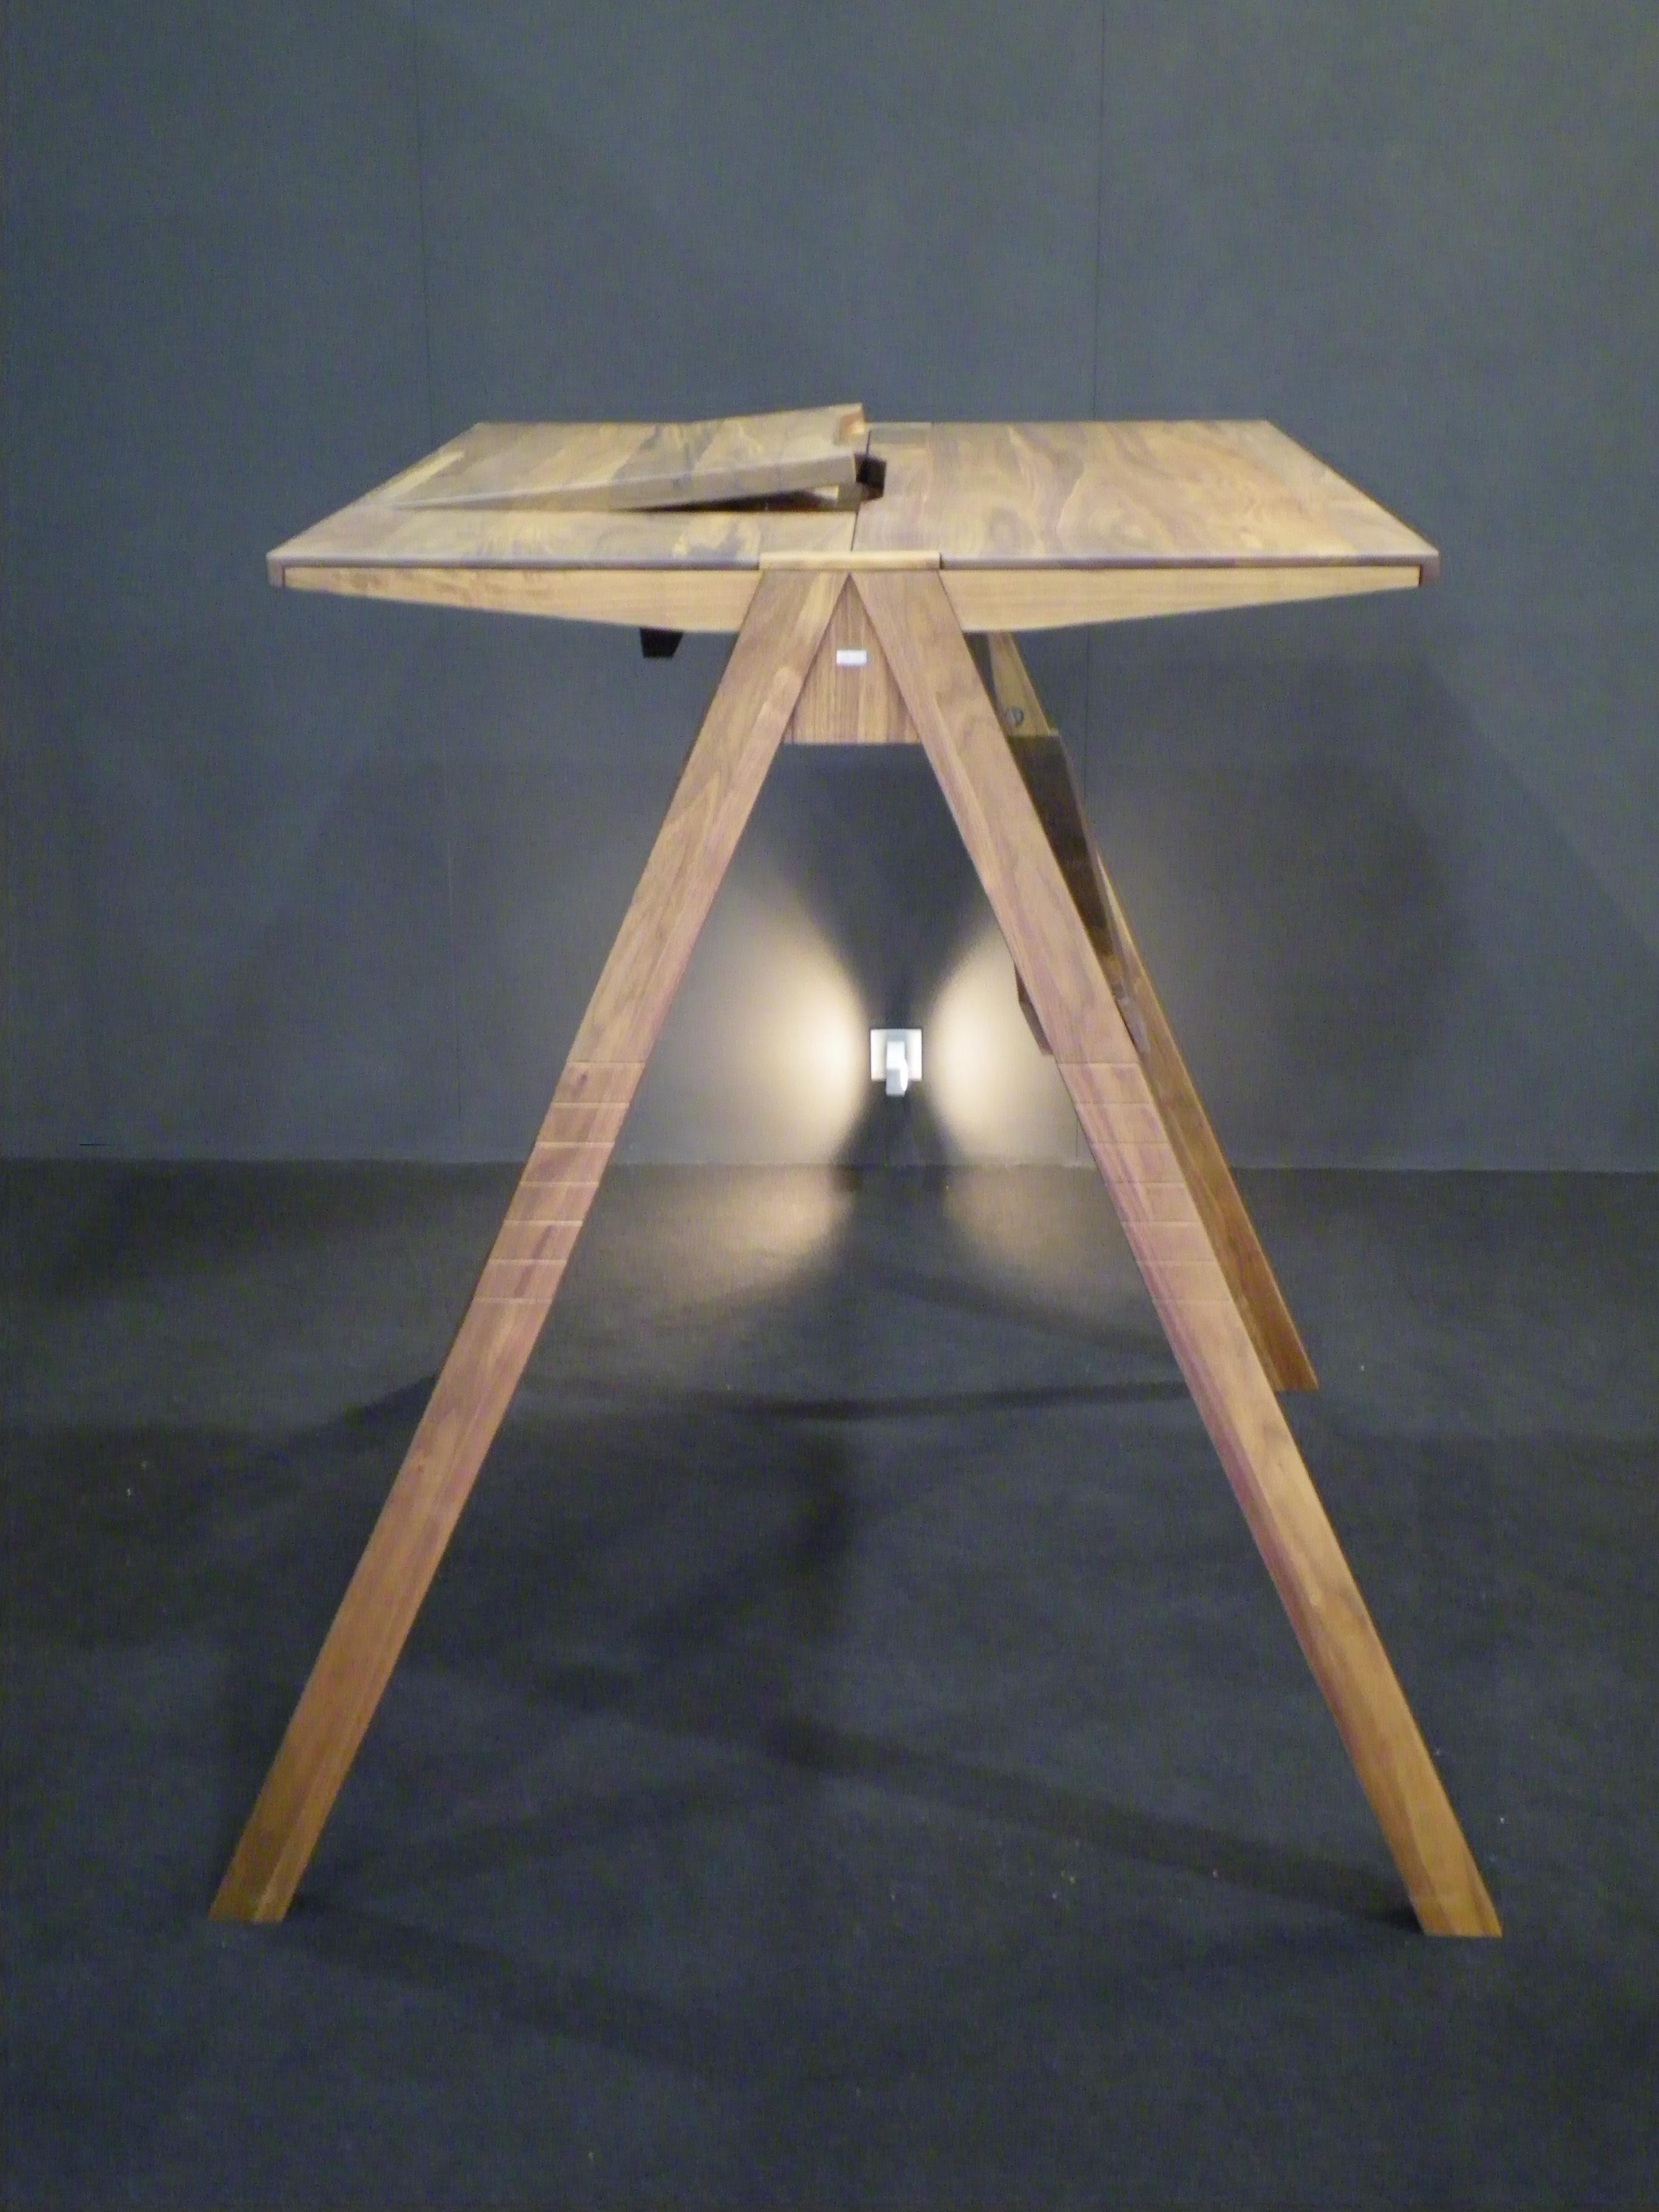 stilvoll archives smow blog english. Black Bedroom Furniture Sets. Home Design Ideas